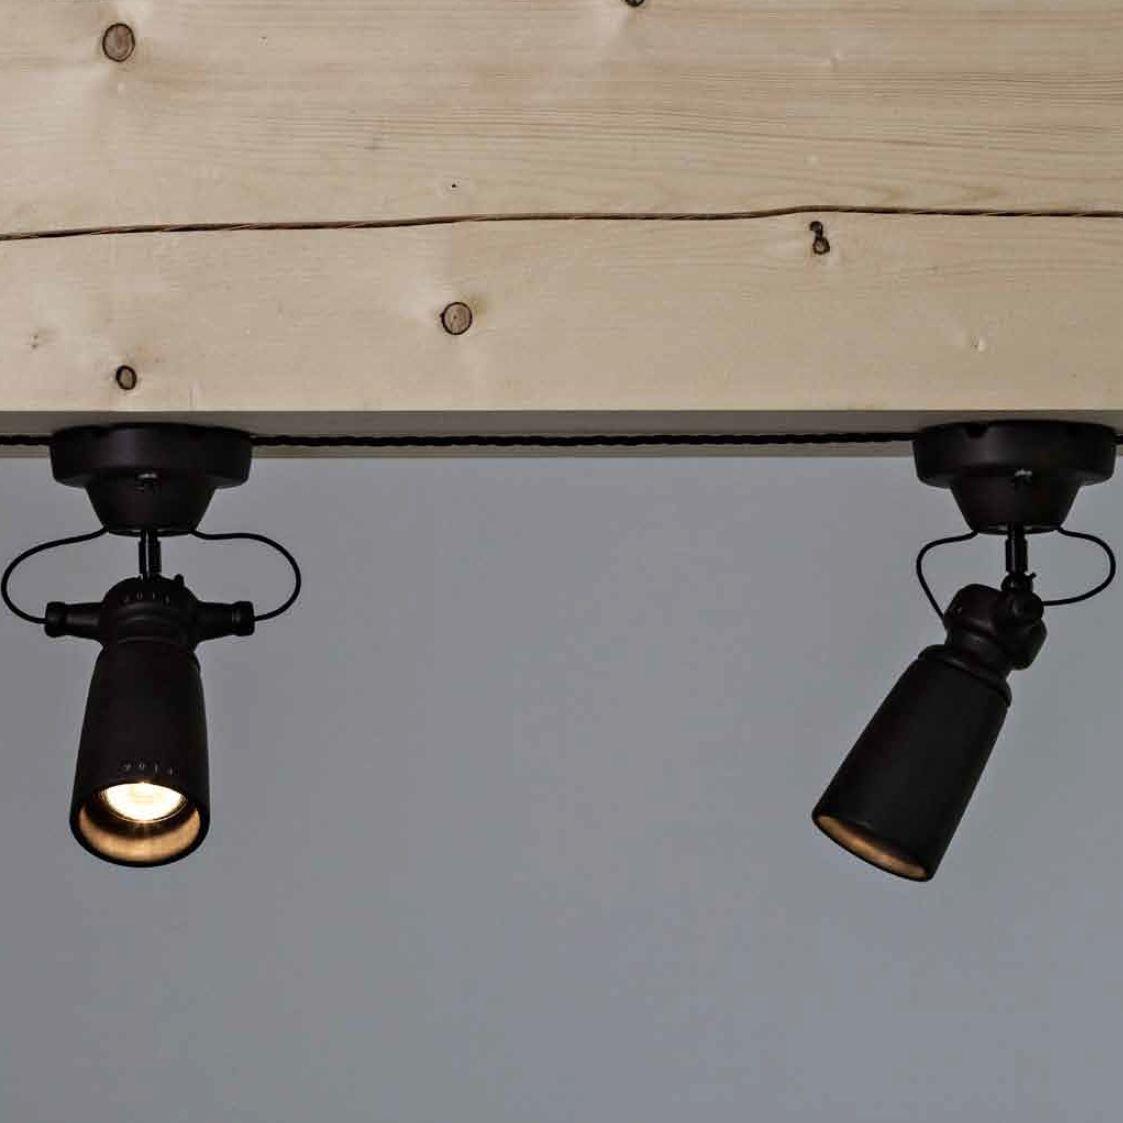 Vintage-Spot als einstellbarer Strahler | Lampen | Pinterest ...